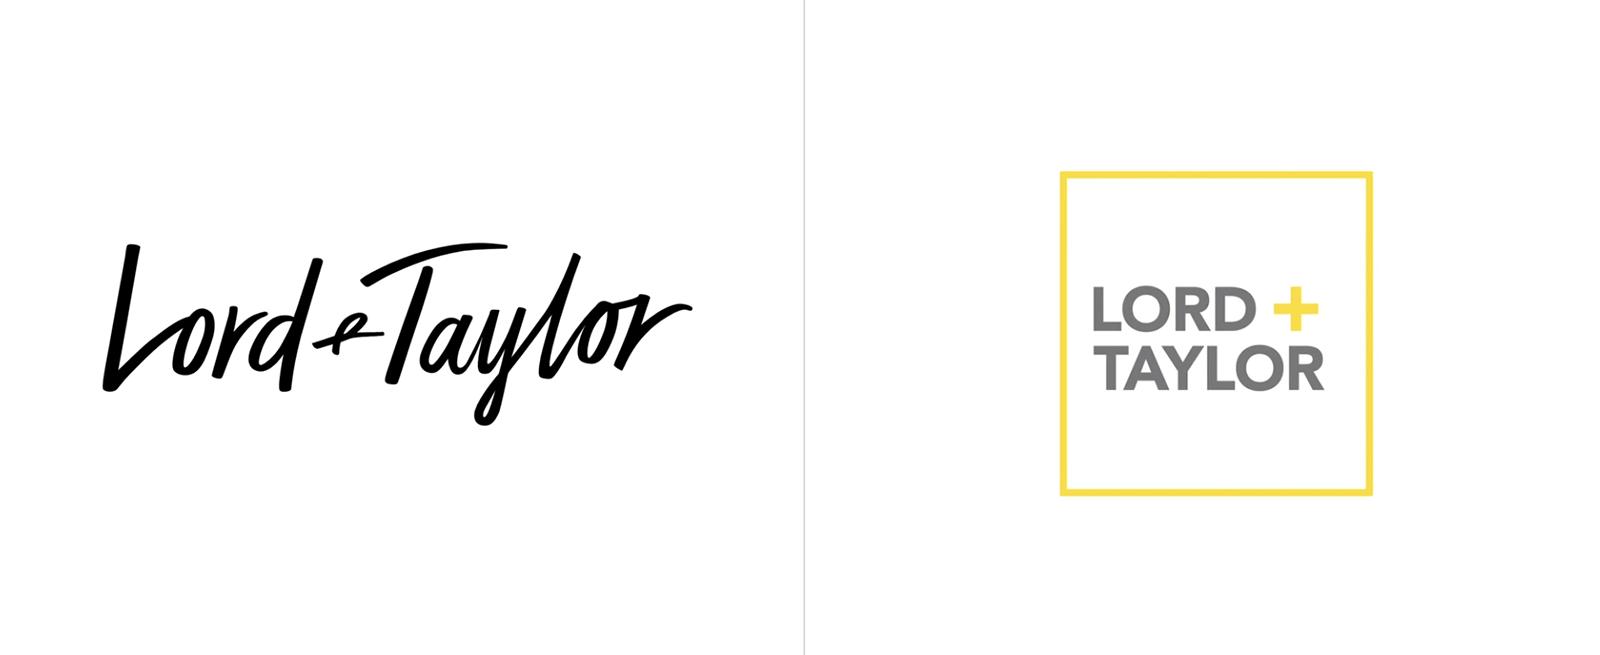 Lord + Taylor连锁商店品牌启用全新的品牌logo设计-深圳vi设计